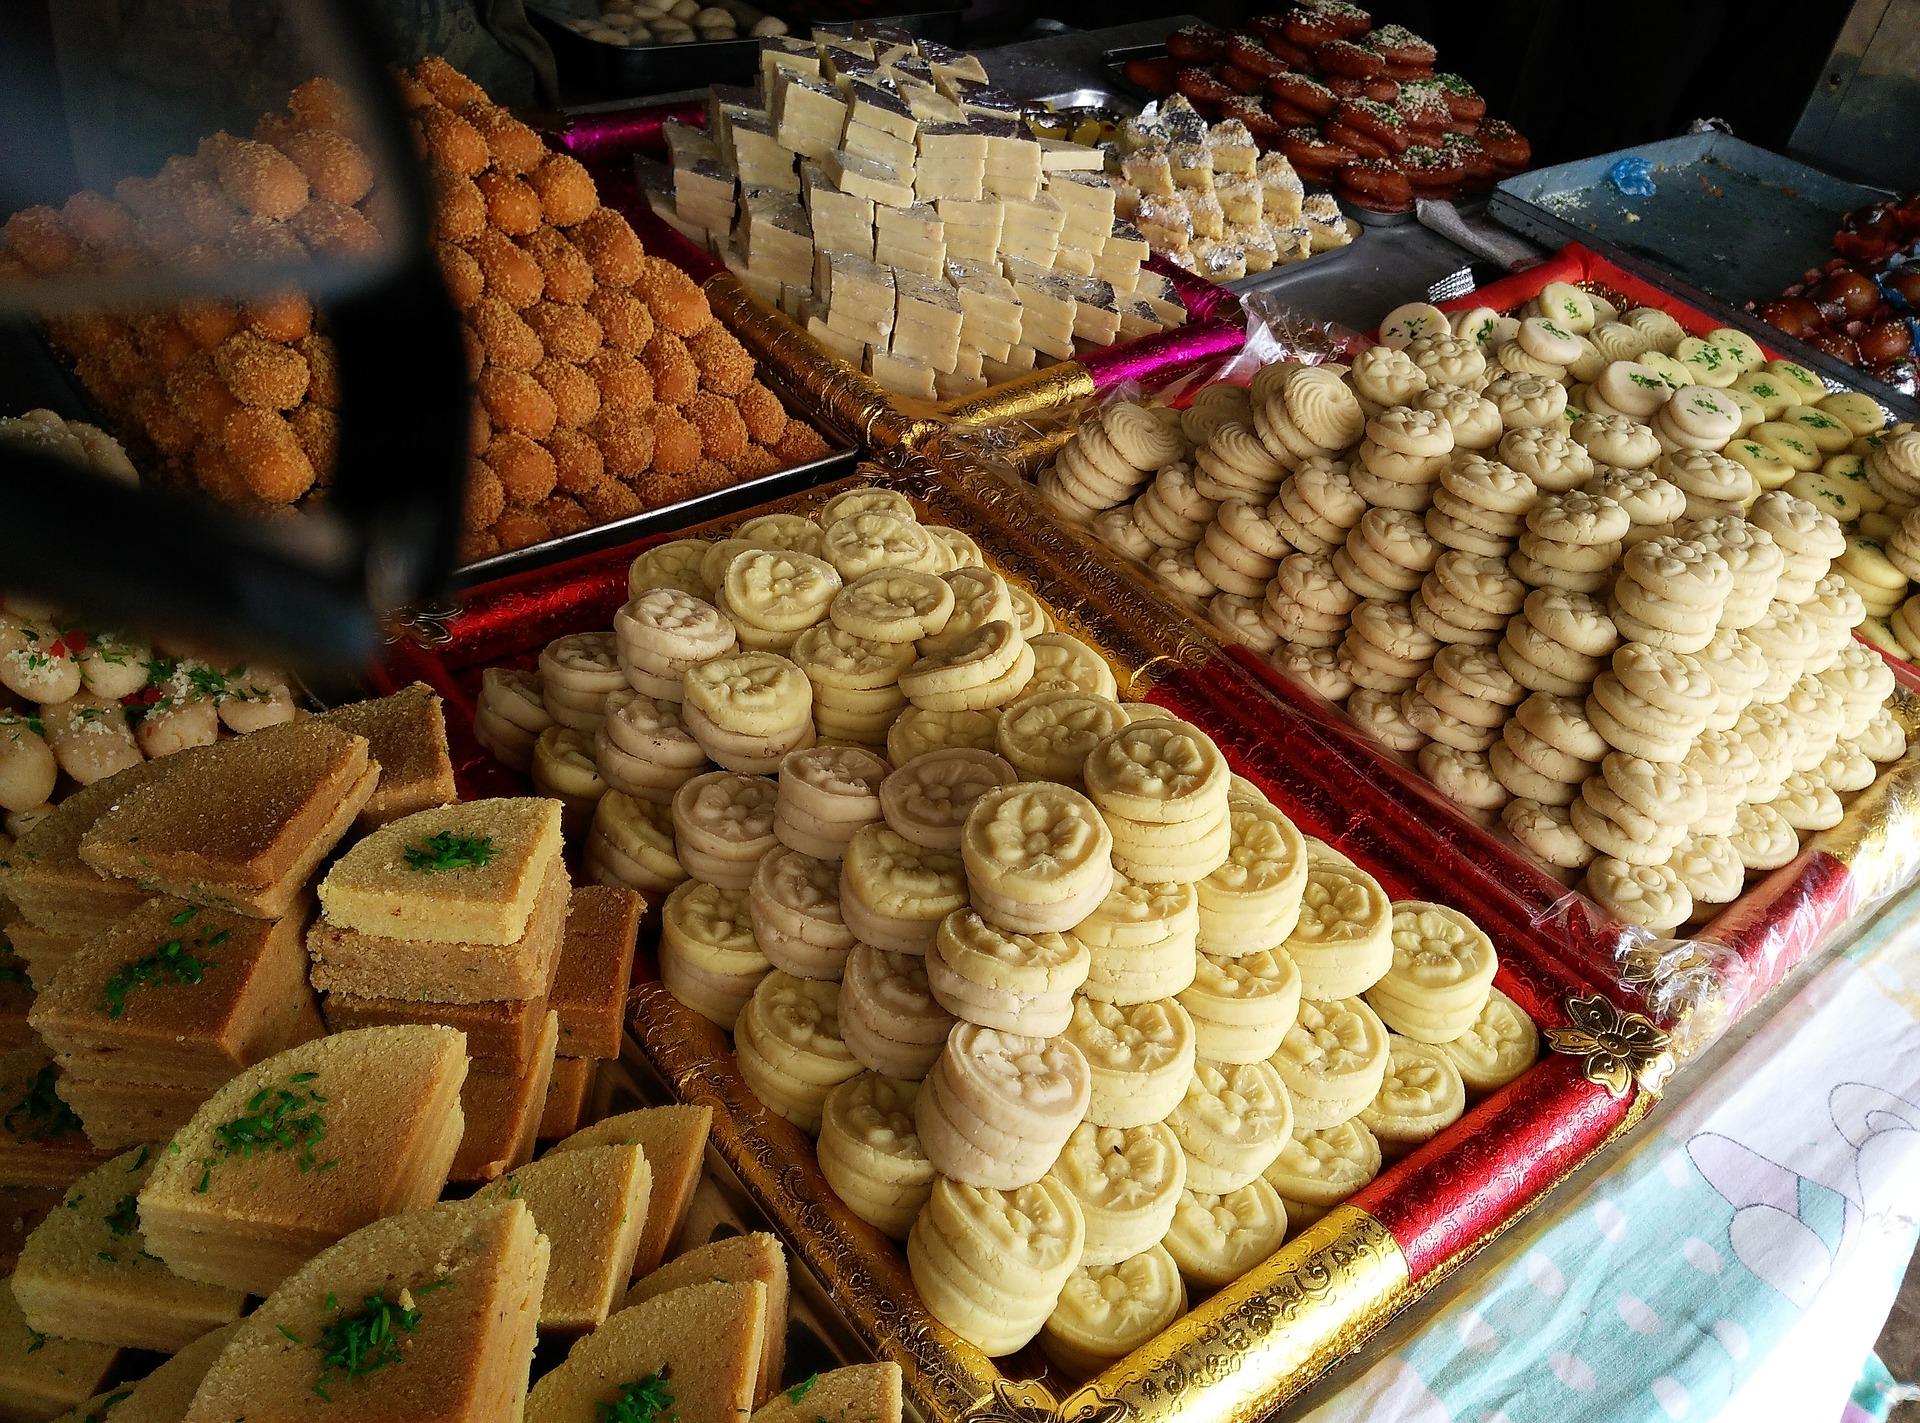 diwali-sweets-2832678_1920.jpg